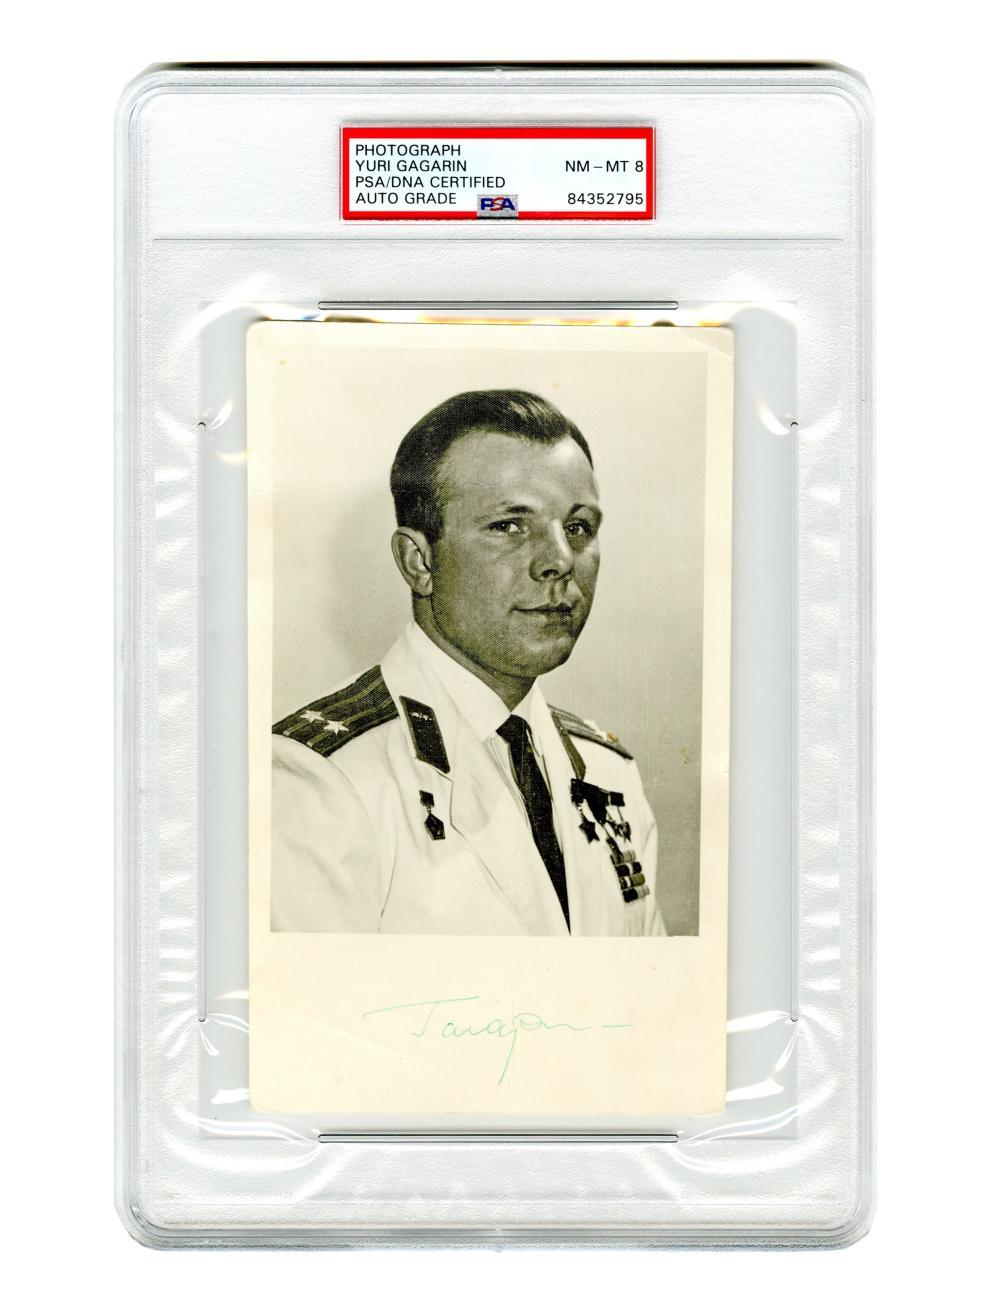 Yuri Gagarin Signed Photograph, PSA/DNA Slabbed & Graded NM-MT 8